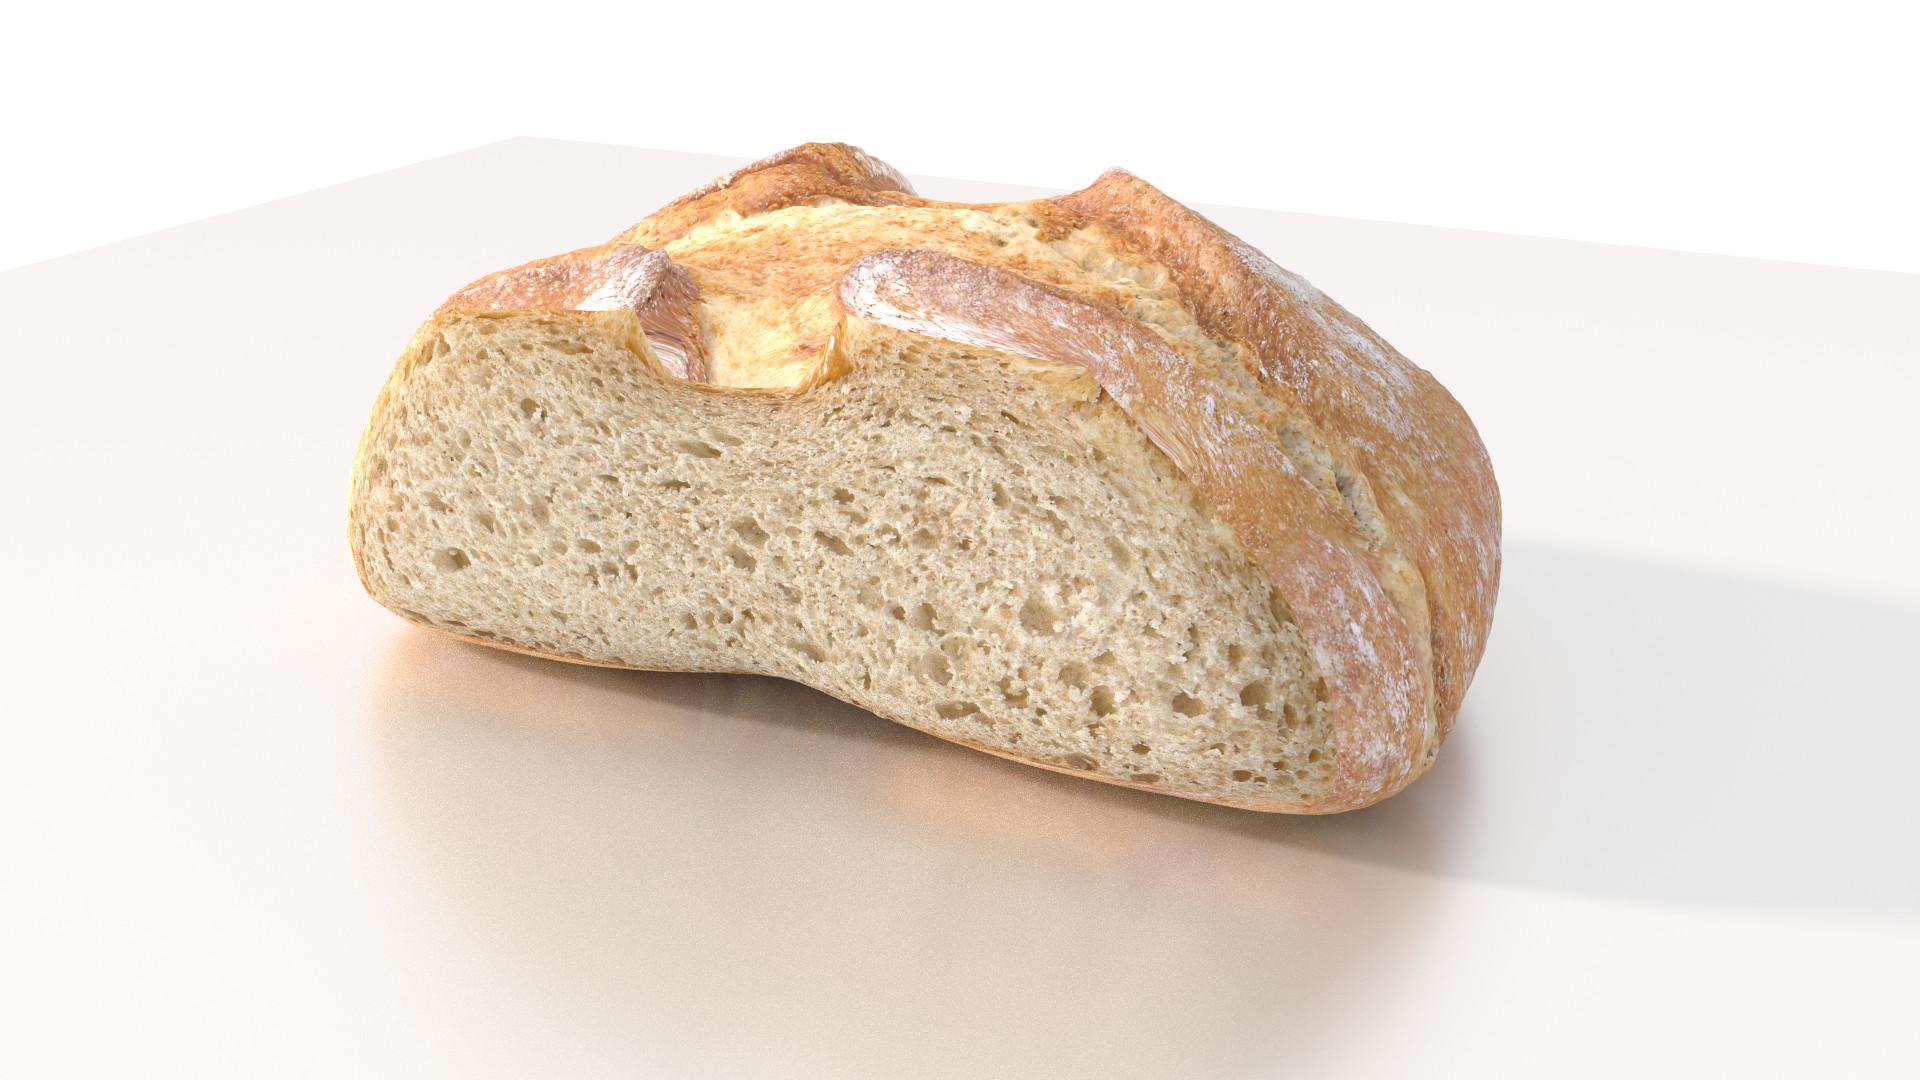 ArtStation - Bread texture, Valerio Coppola